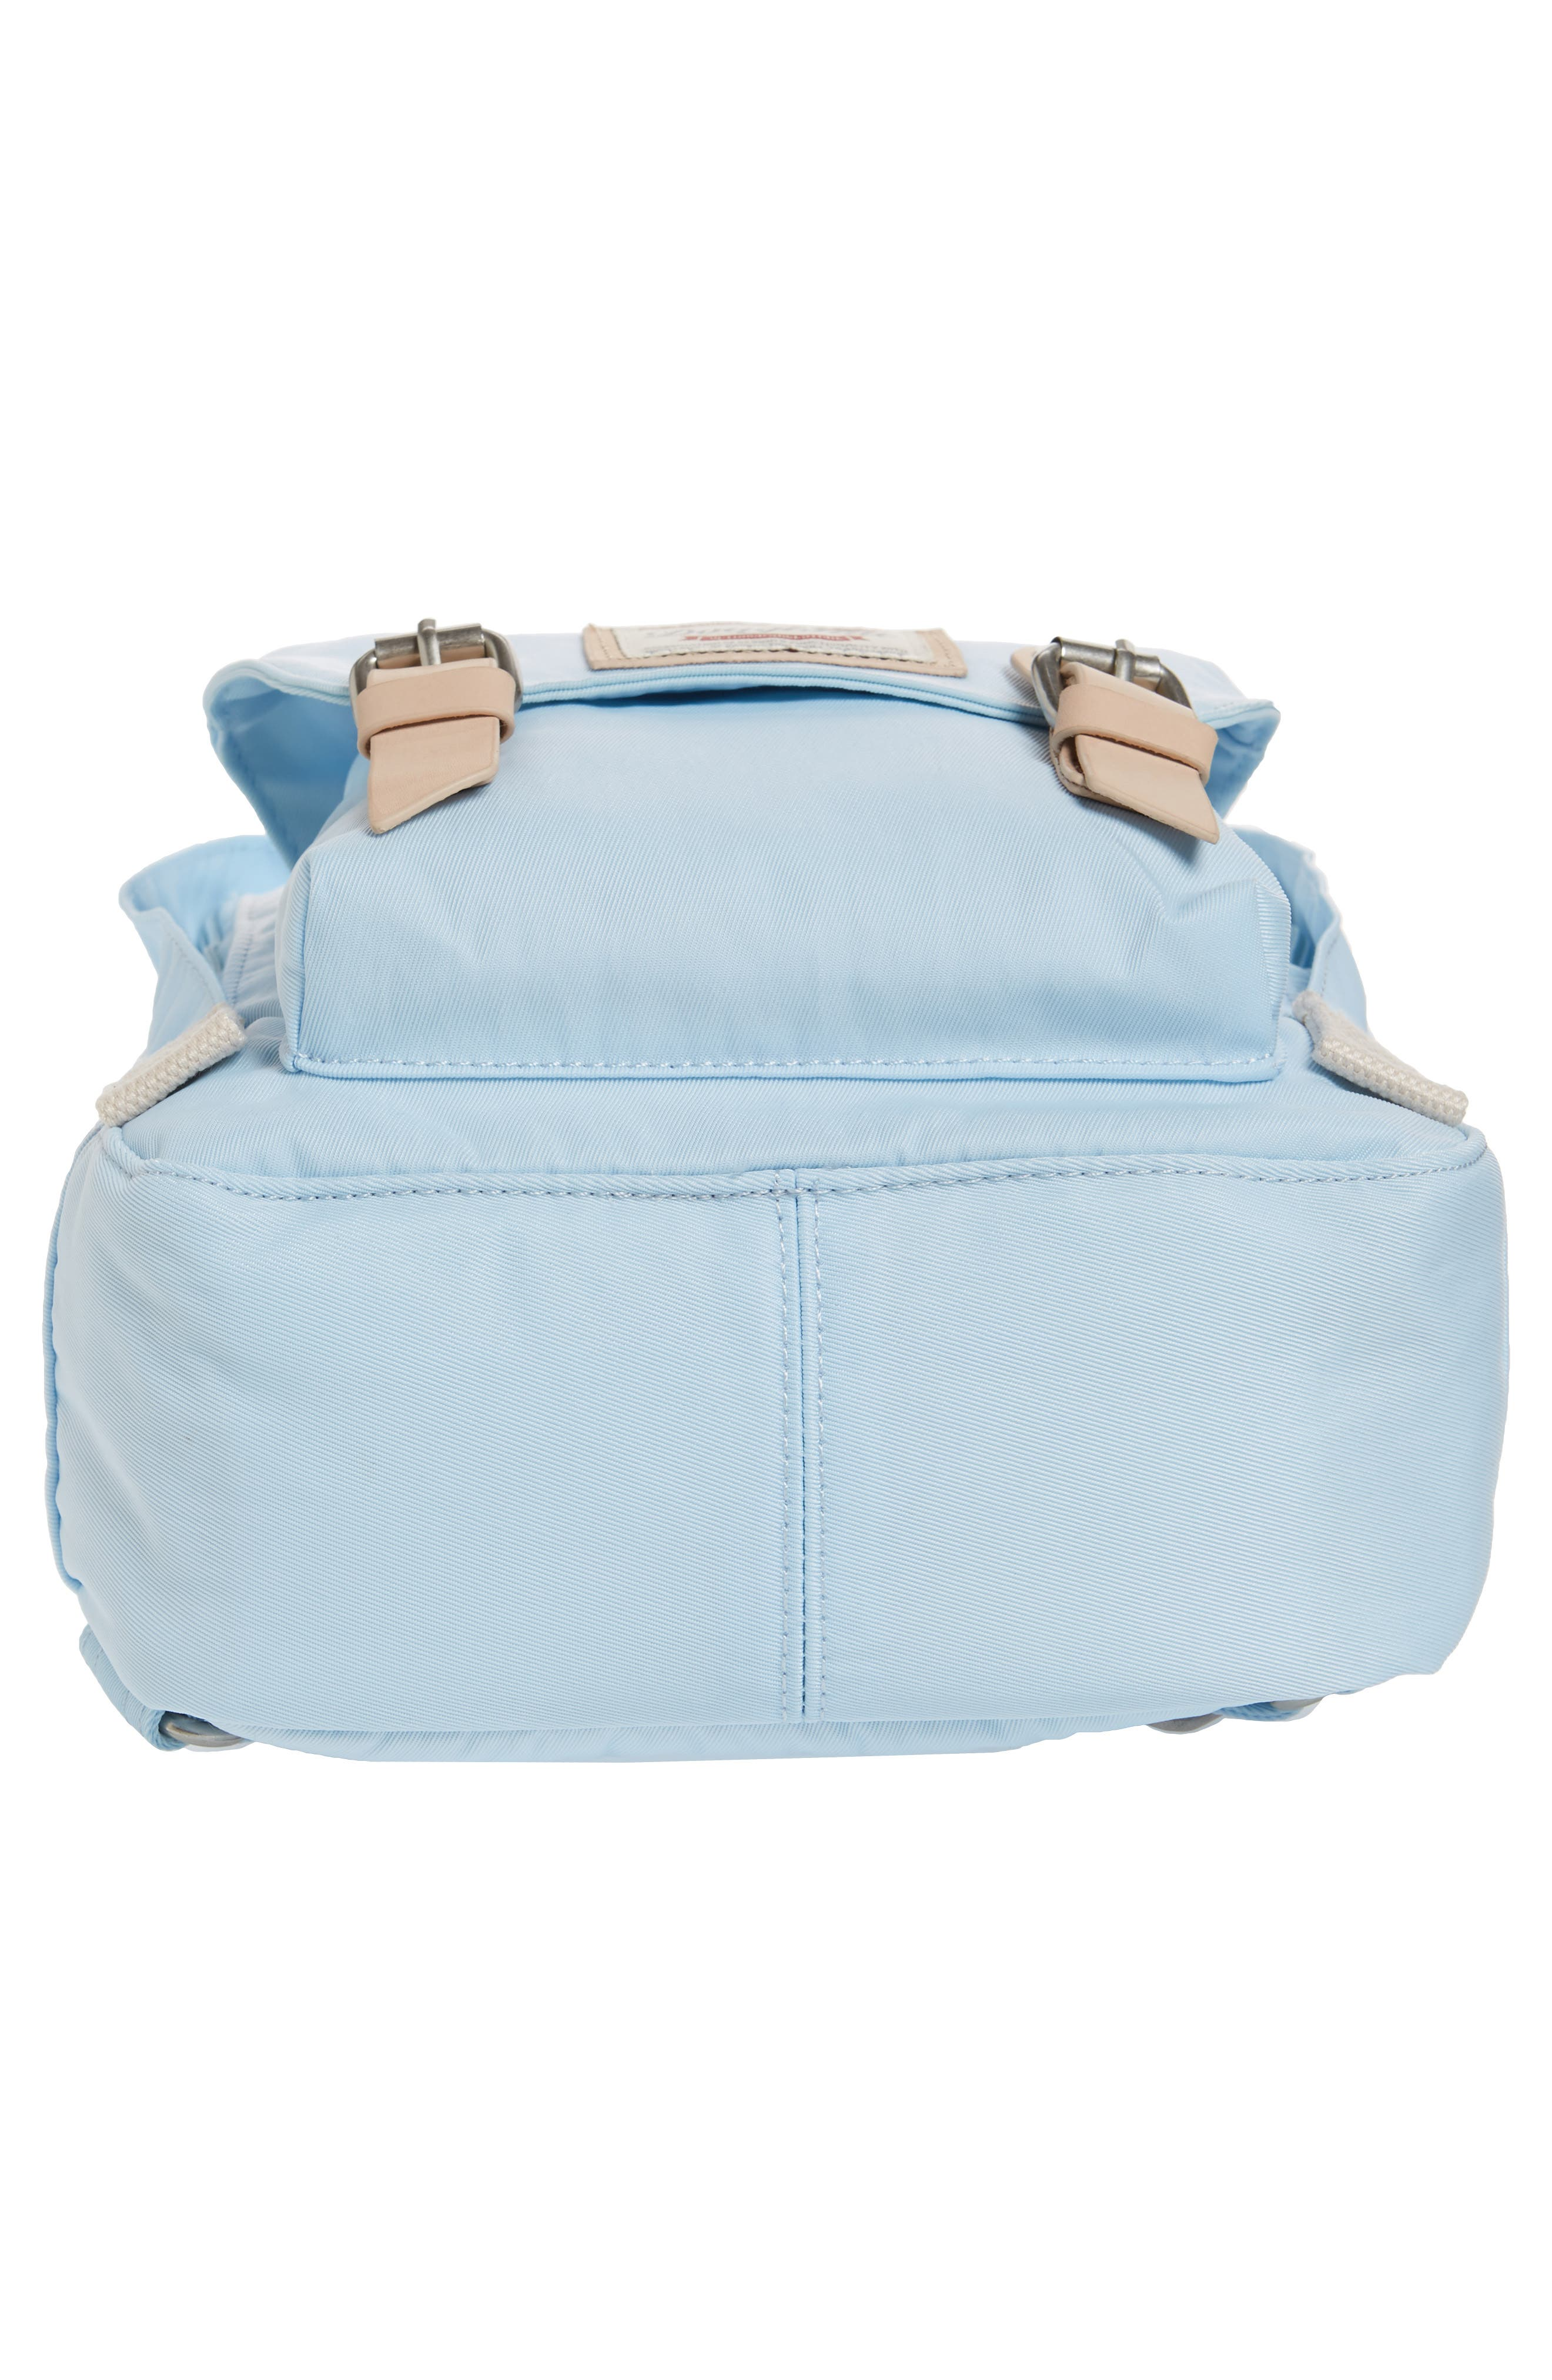 Mini Macaroon Water Resistant Backpack,                             Alternate thumbnail 4, color,                             Iceberg